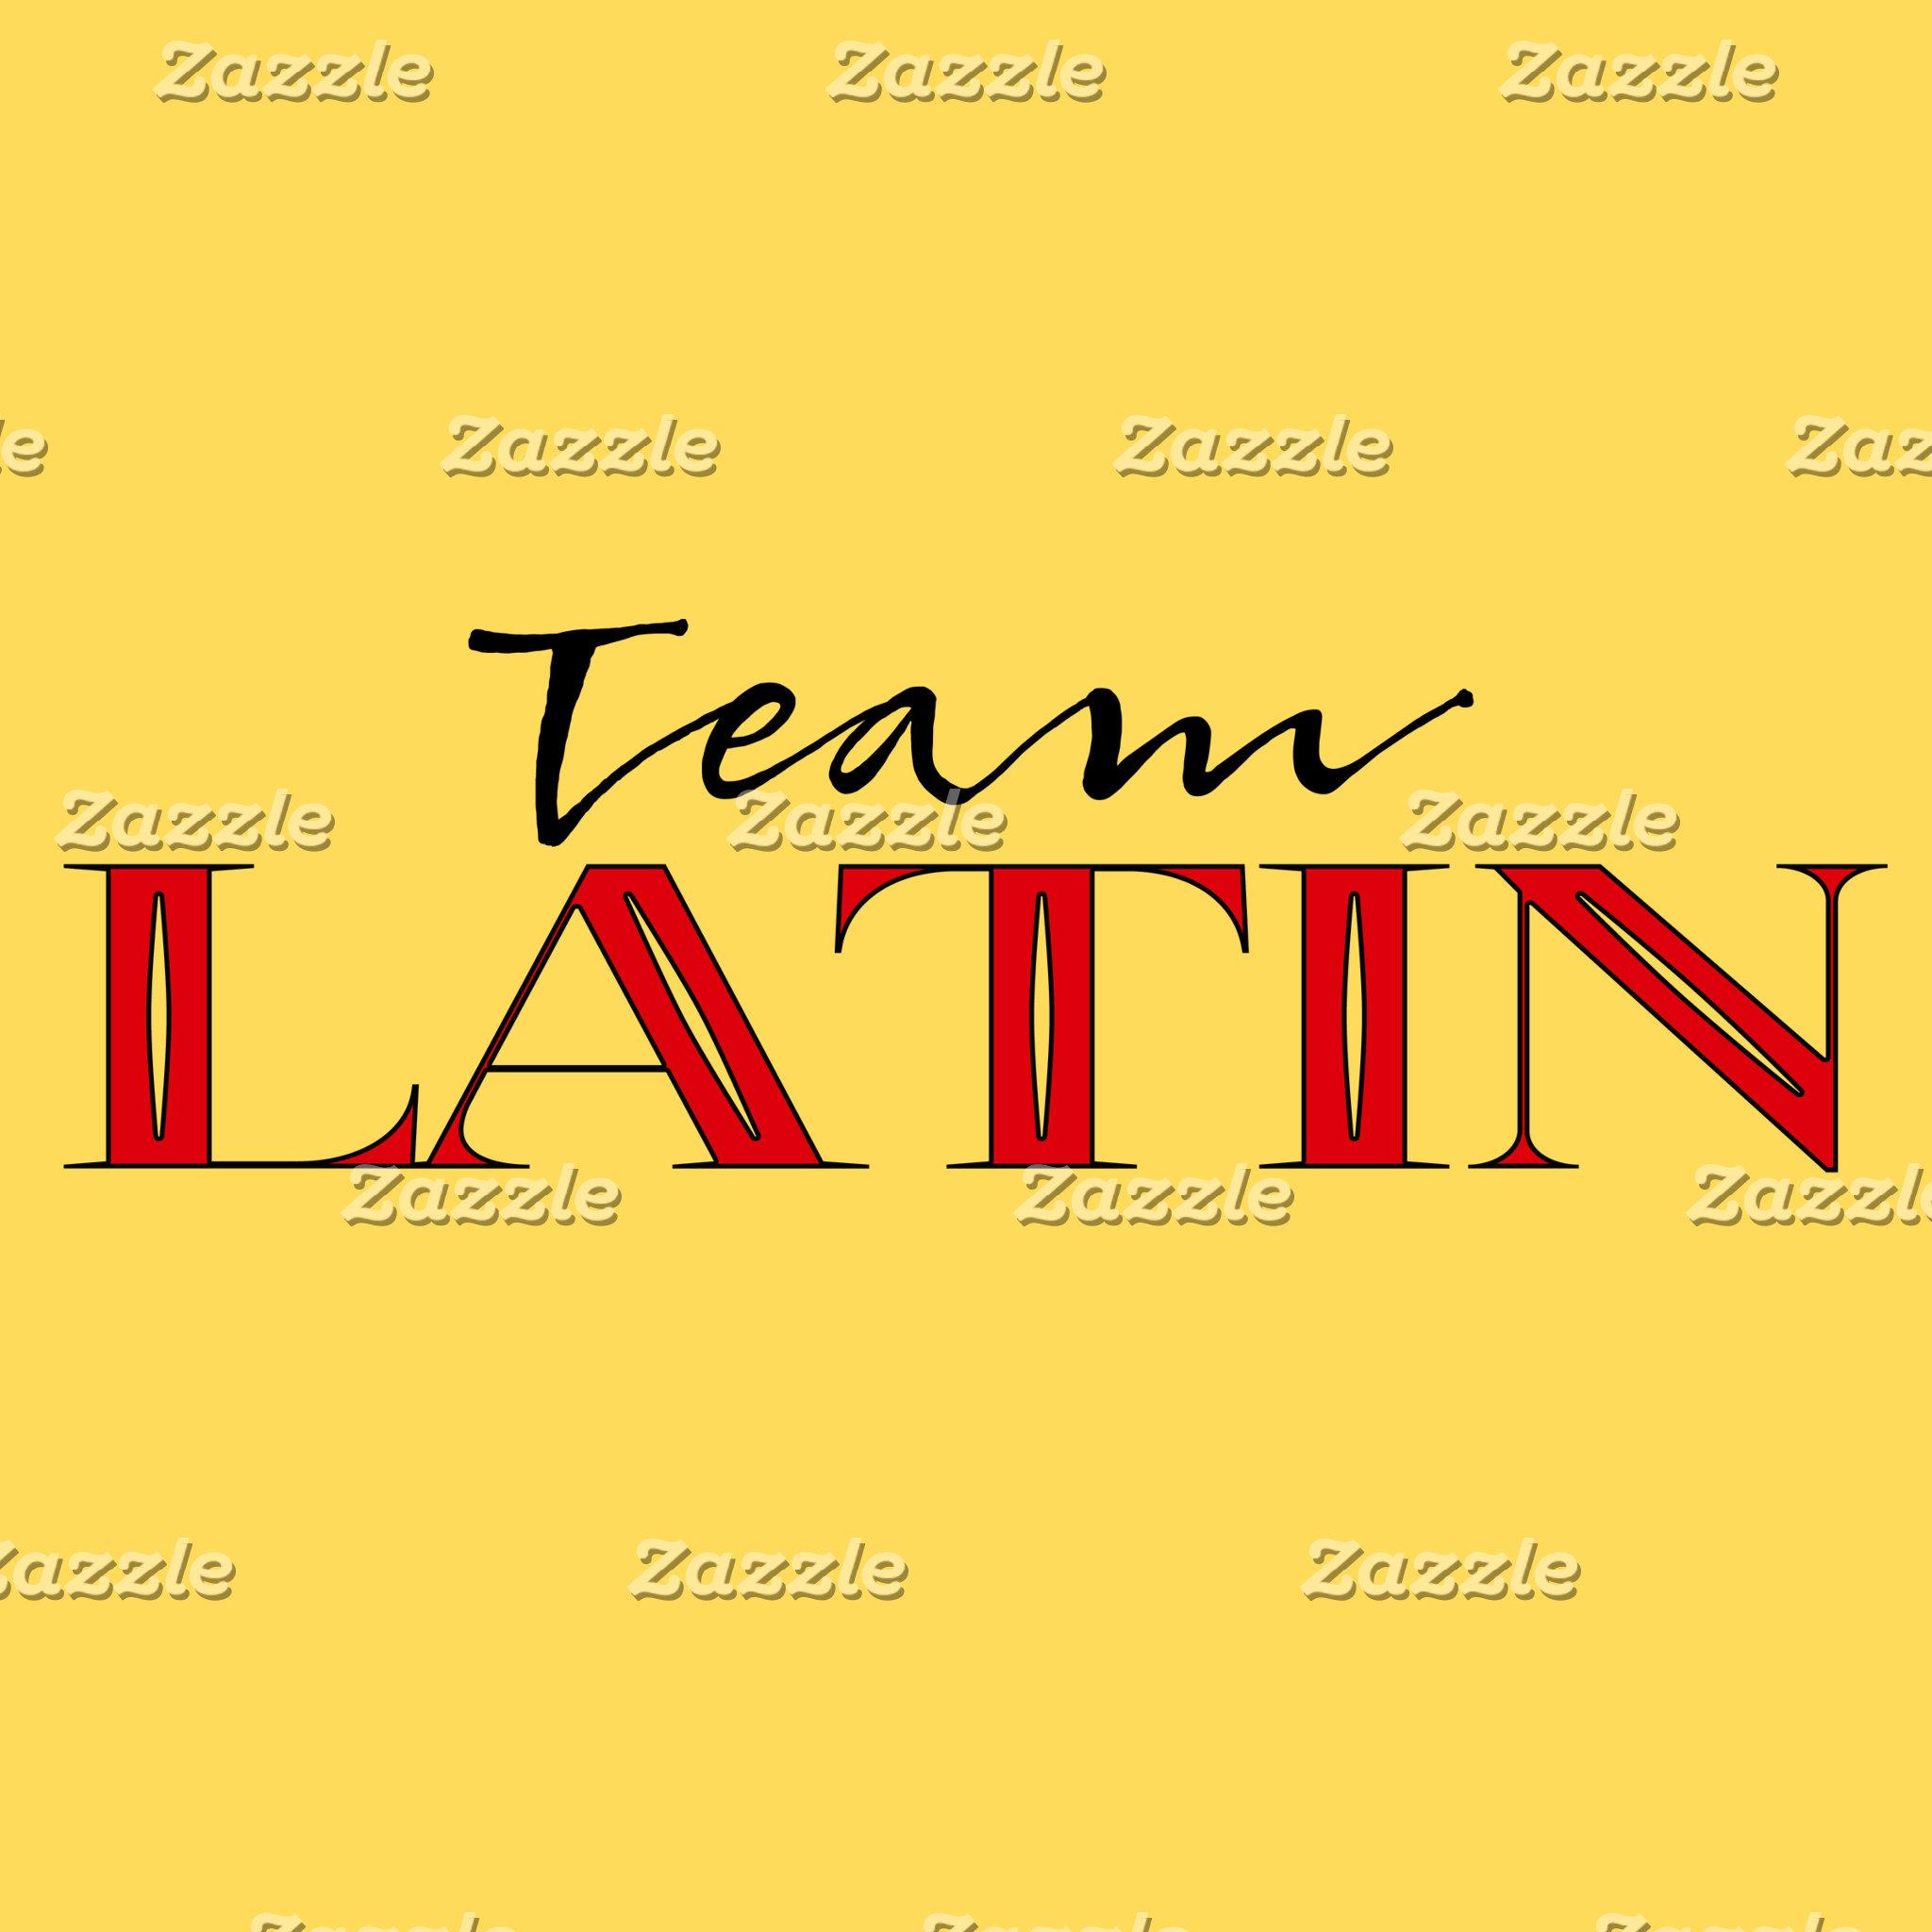 Team Latin